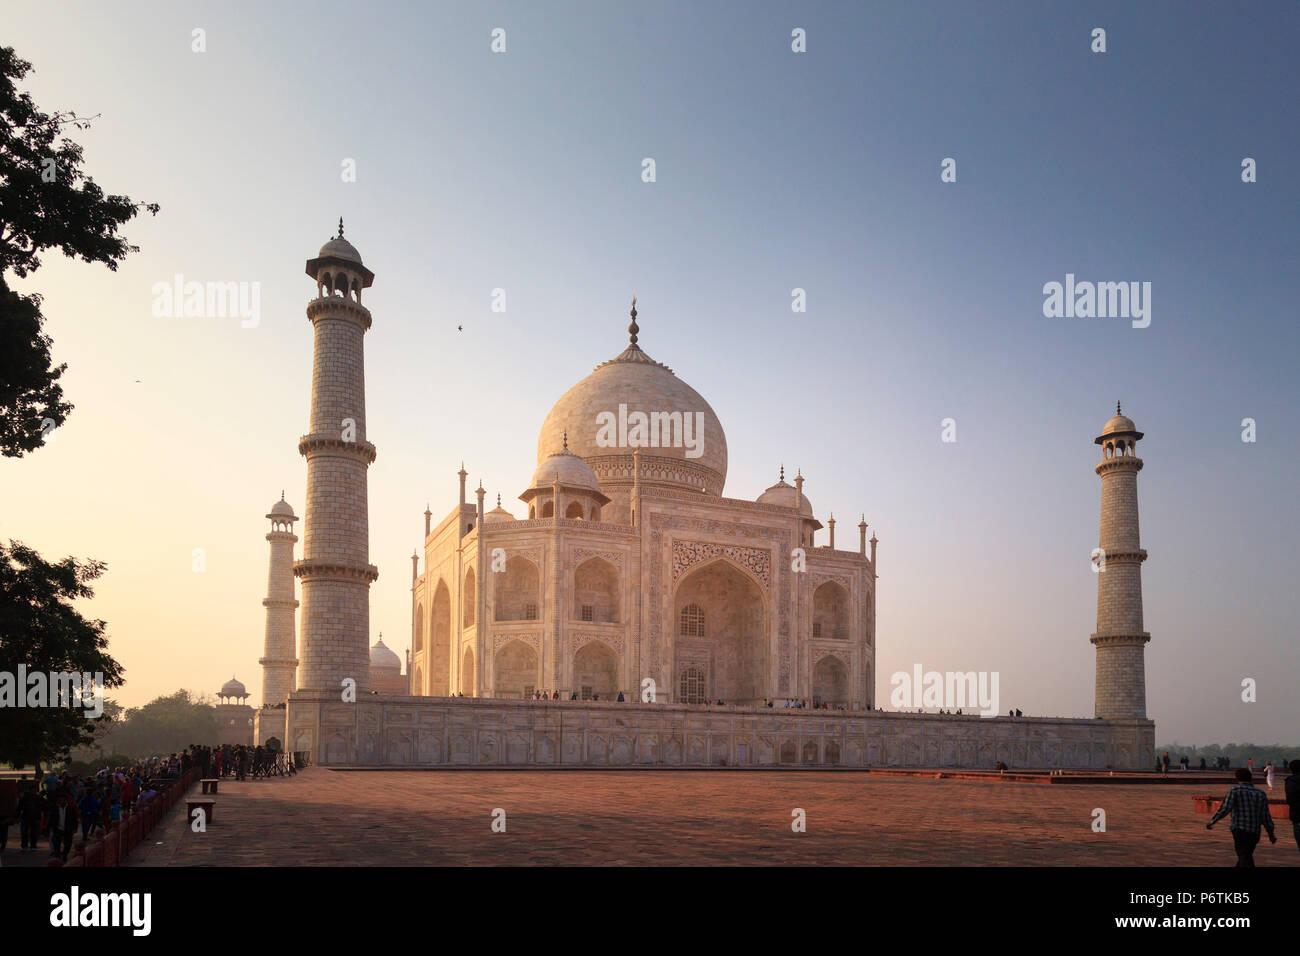 Indien, Uttar Pradesh, Agra, Taj Mahal (UNESCO-Website) Stockbild